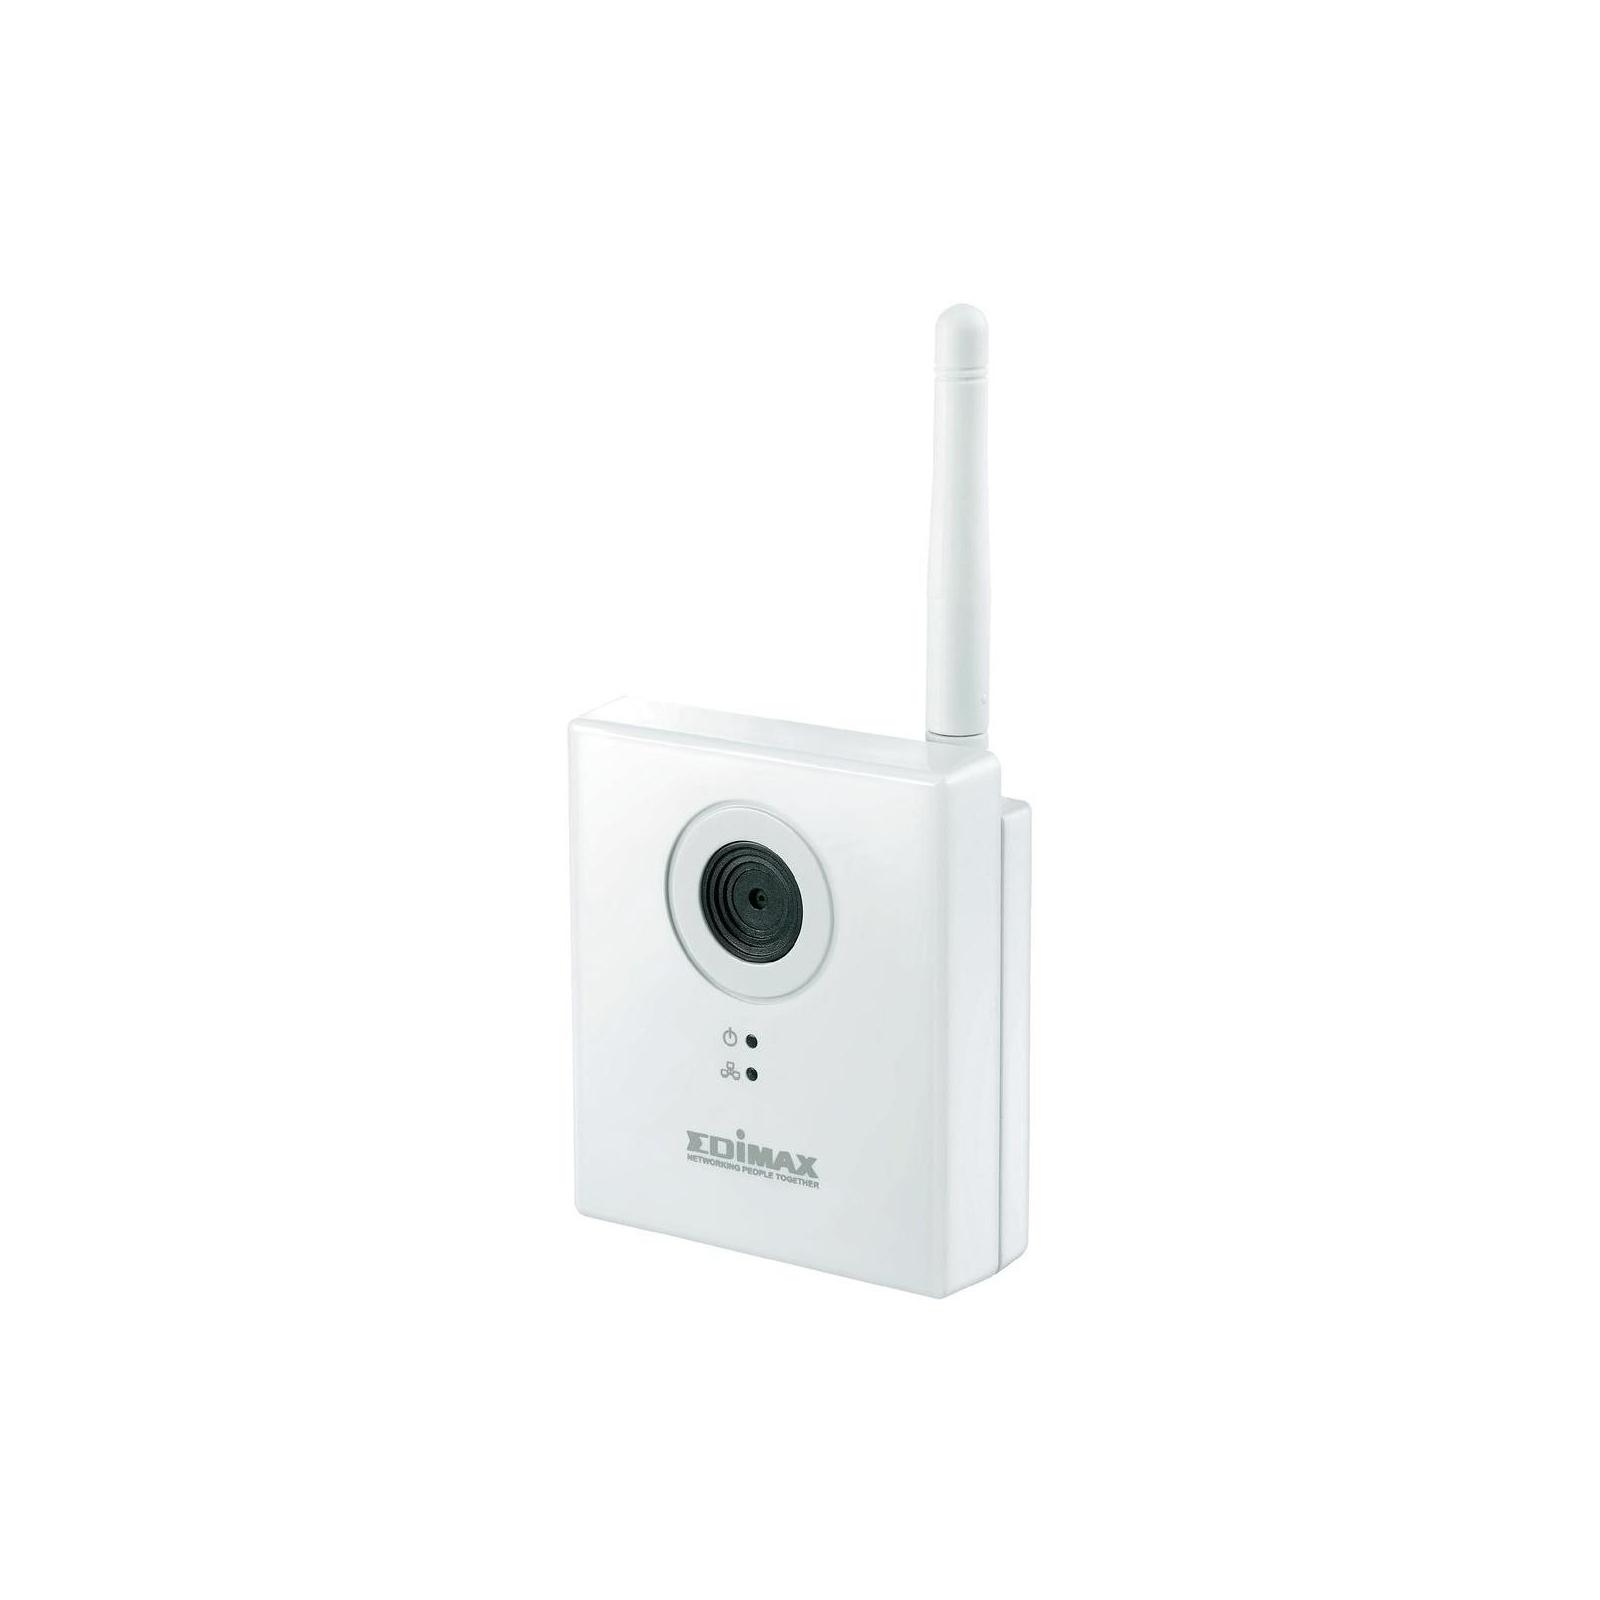 Сетевая камера EDIMAX IC-3115W изображение 3